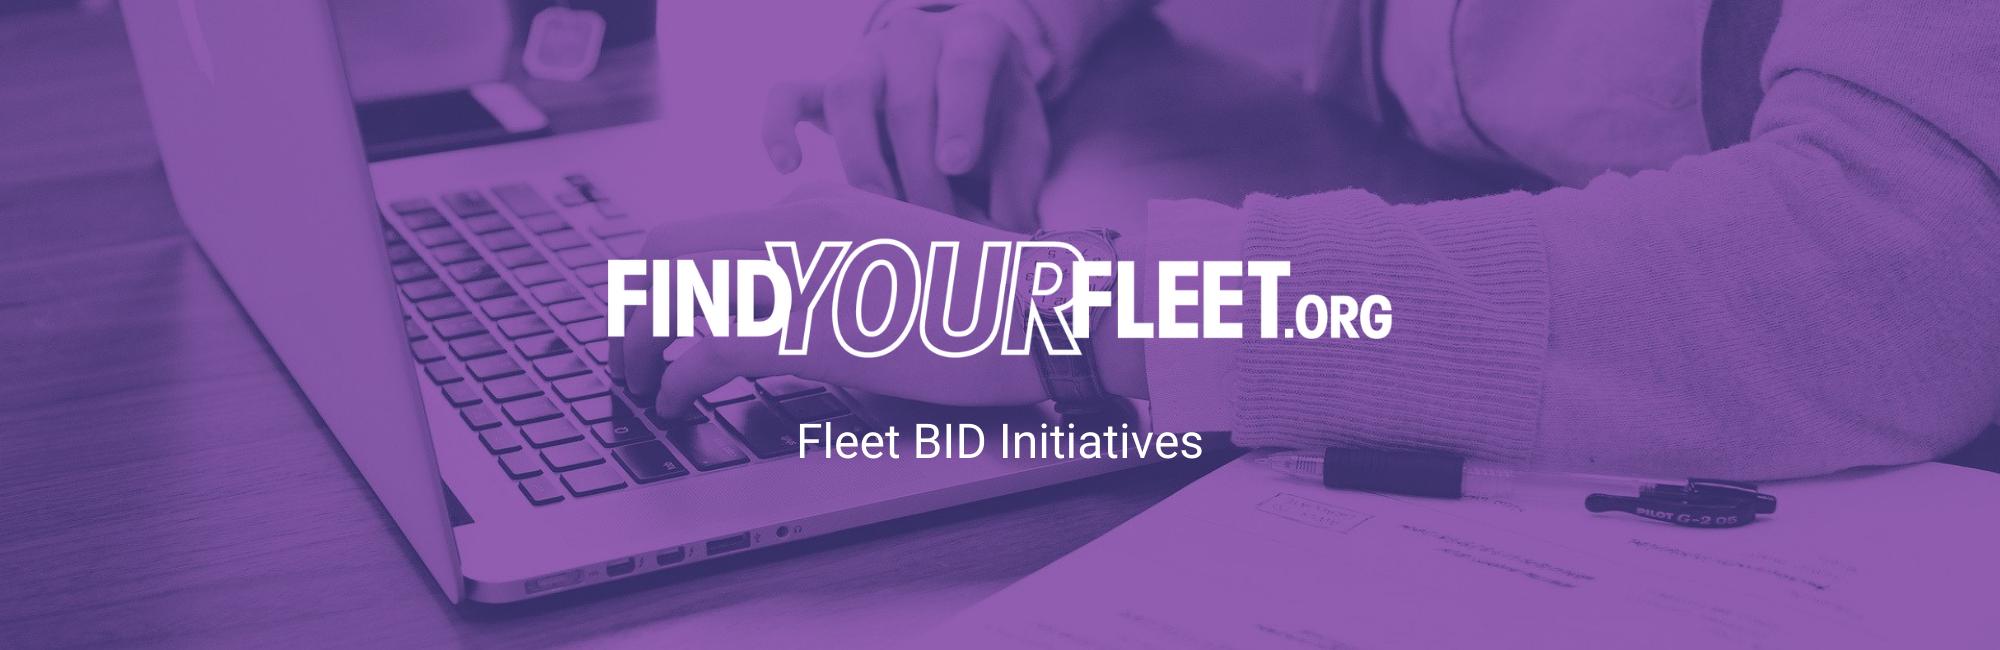 Fleet BID Initiatives